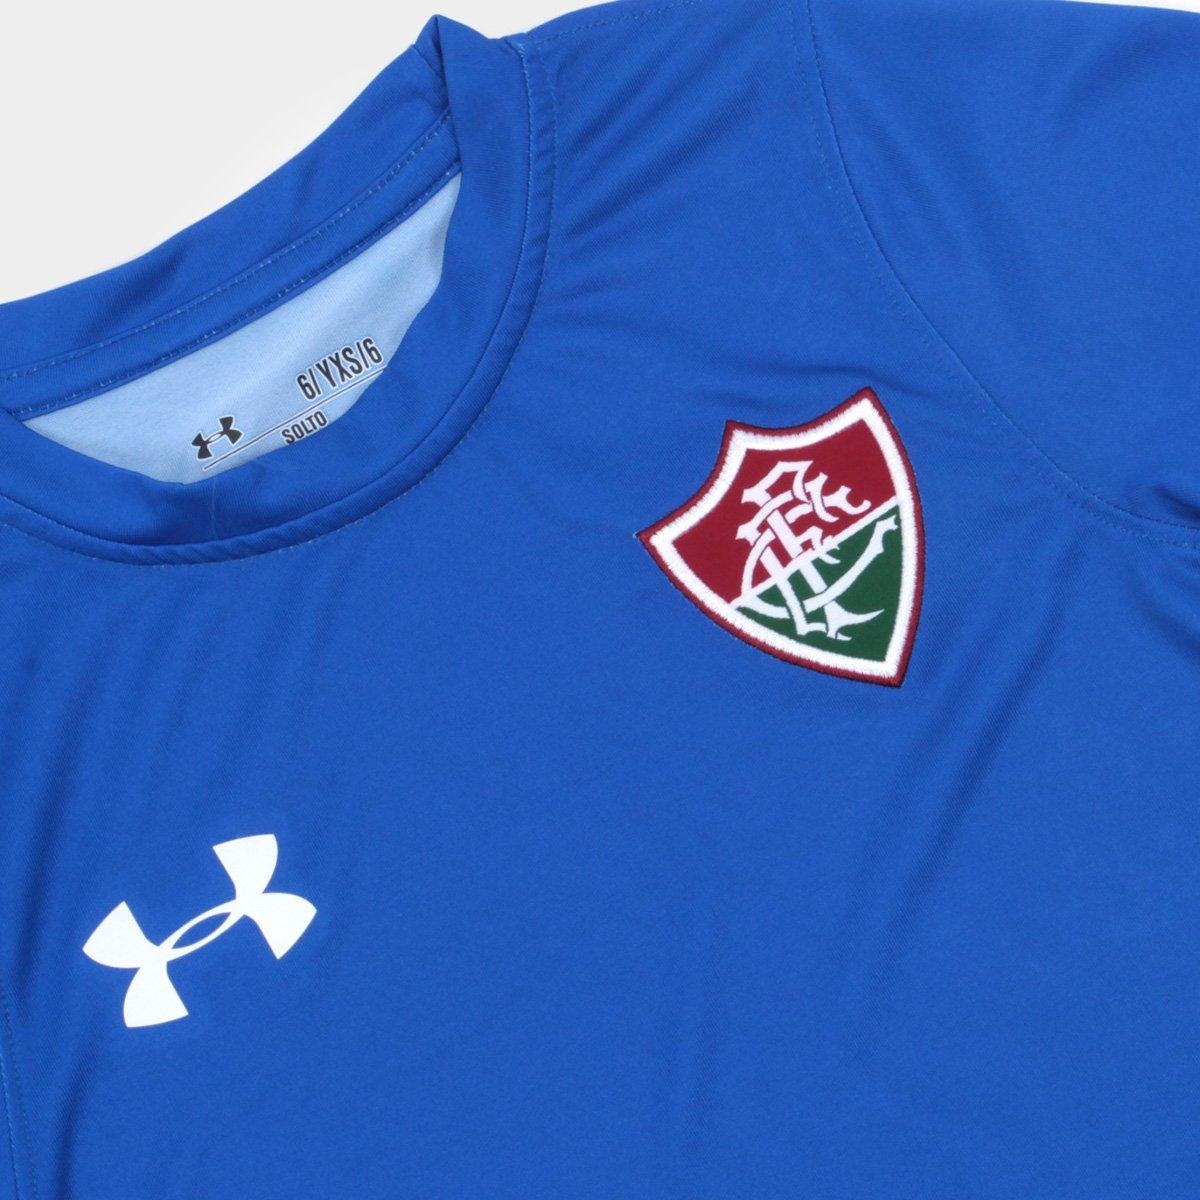 46e8b3f206 Camisa Fluminense I Infantil 17 18 s nº Torcedor Under Armour - Azul ...